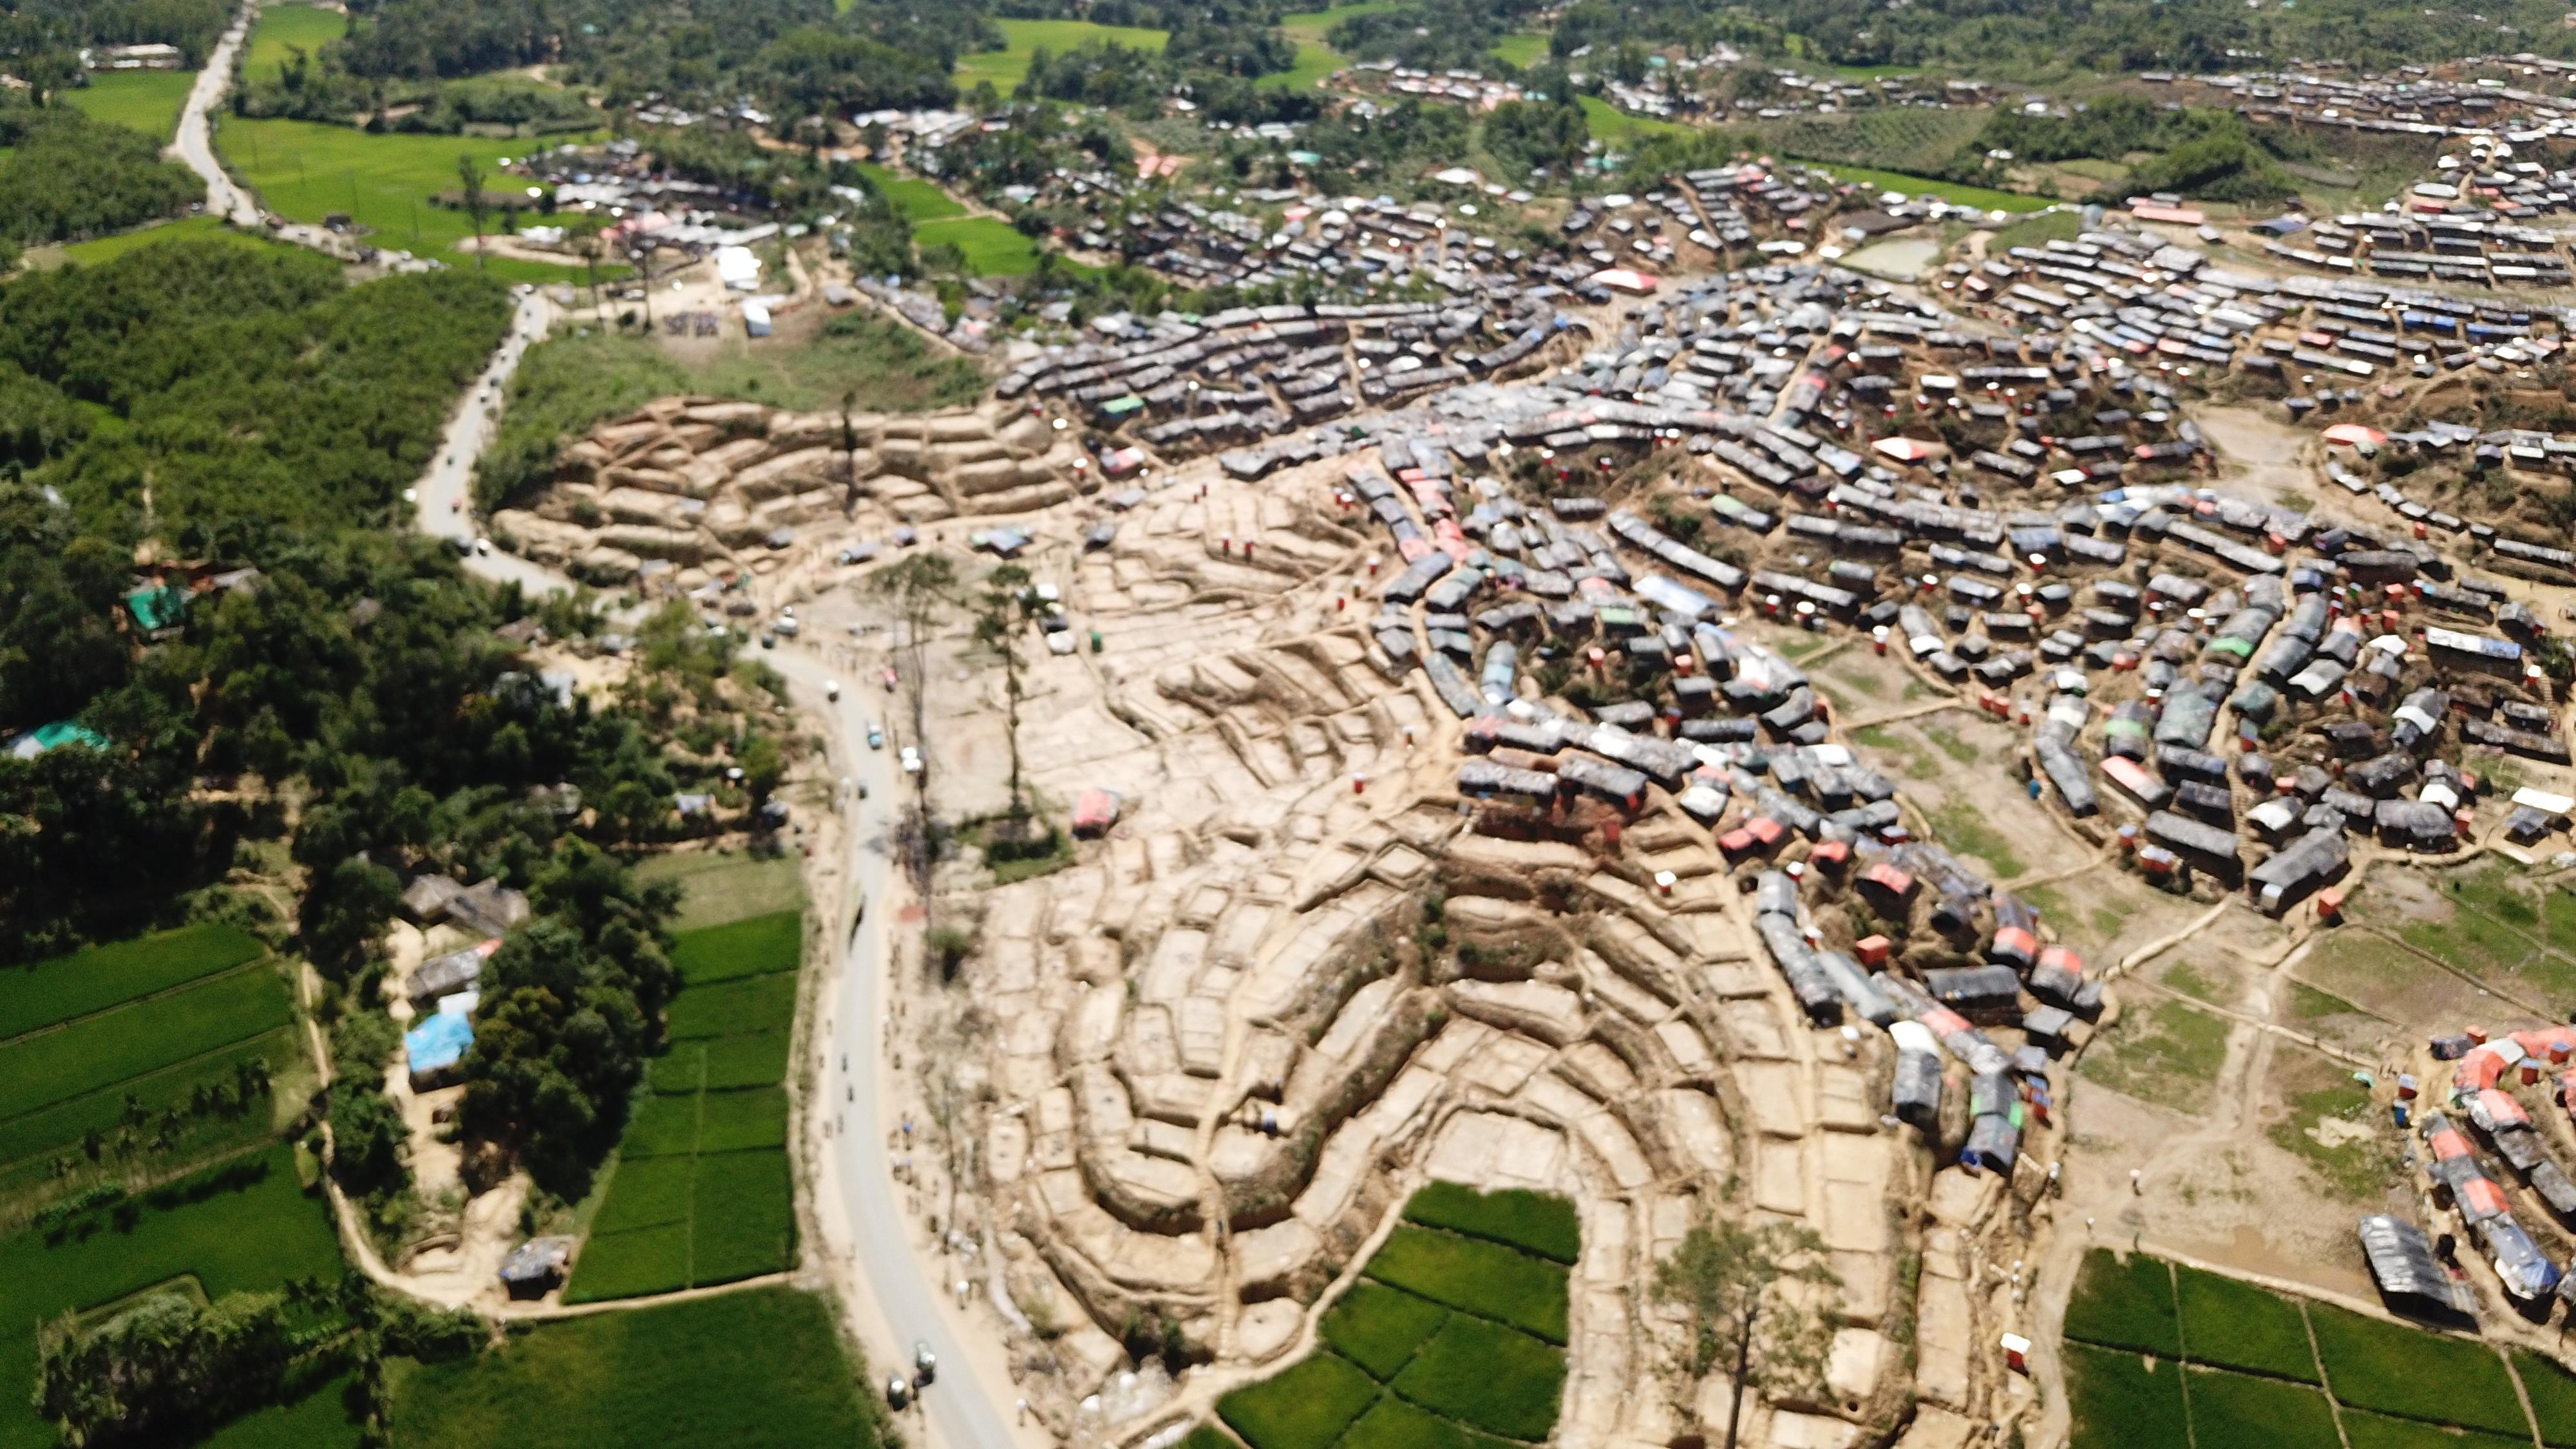 Earthworks in a refugee camp